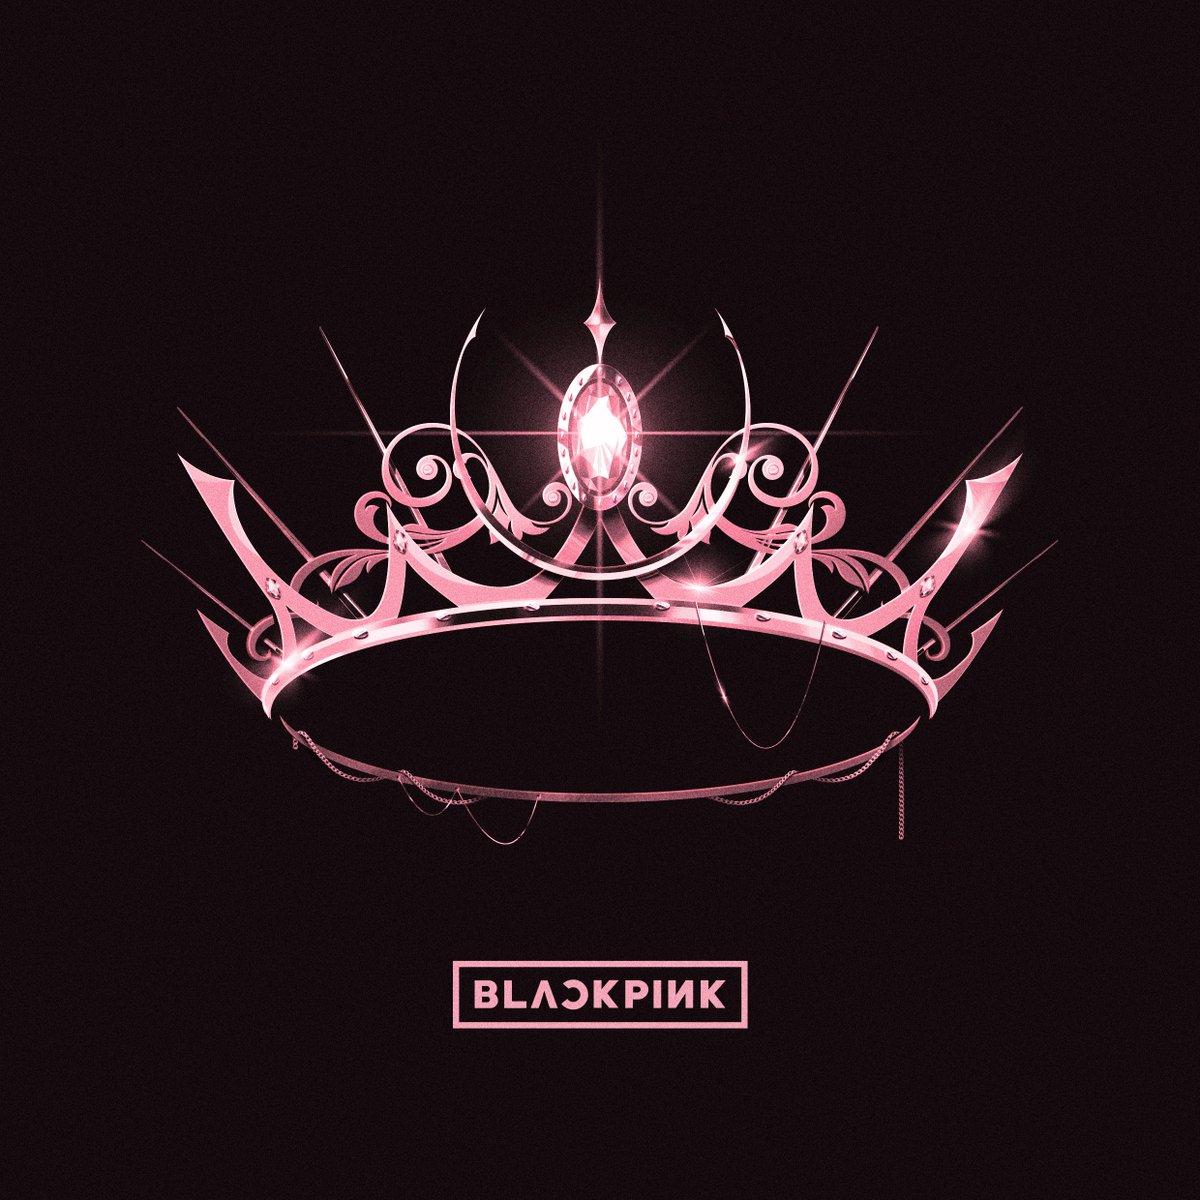 #BLACKPINK 1st Full Album [THE ALBUM] Notice has been uploaded ▶️facebook.com/BLACKPINKOFFIC… #블랙핑크 #JISOO #JENNIE #ROSÉ #LISA #YG